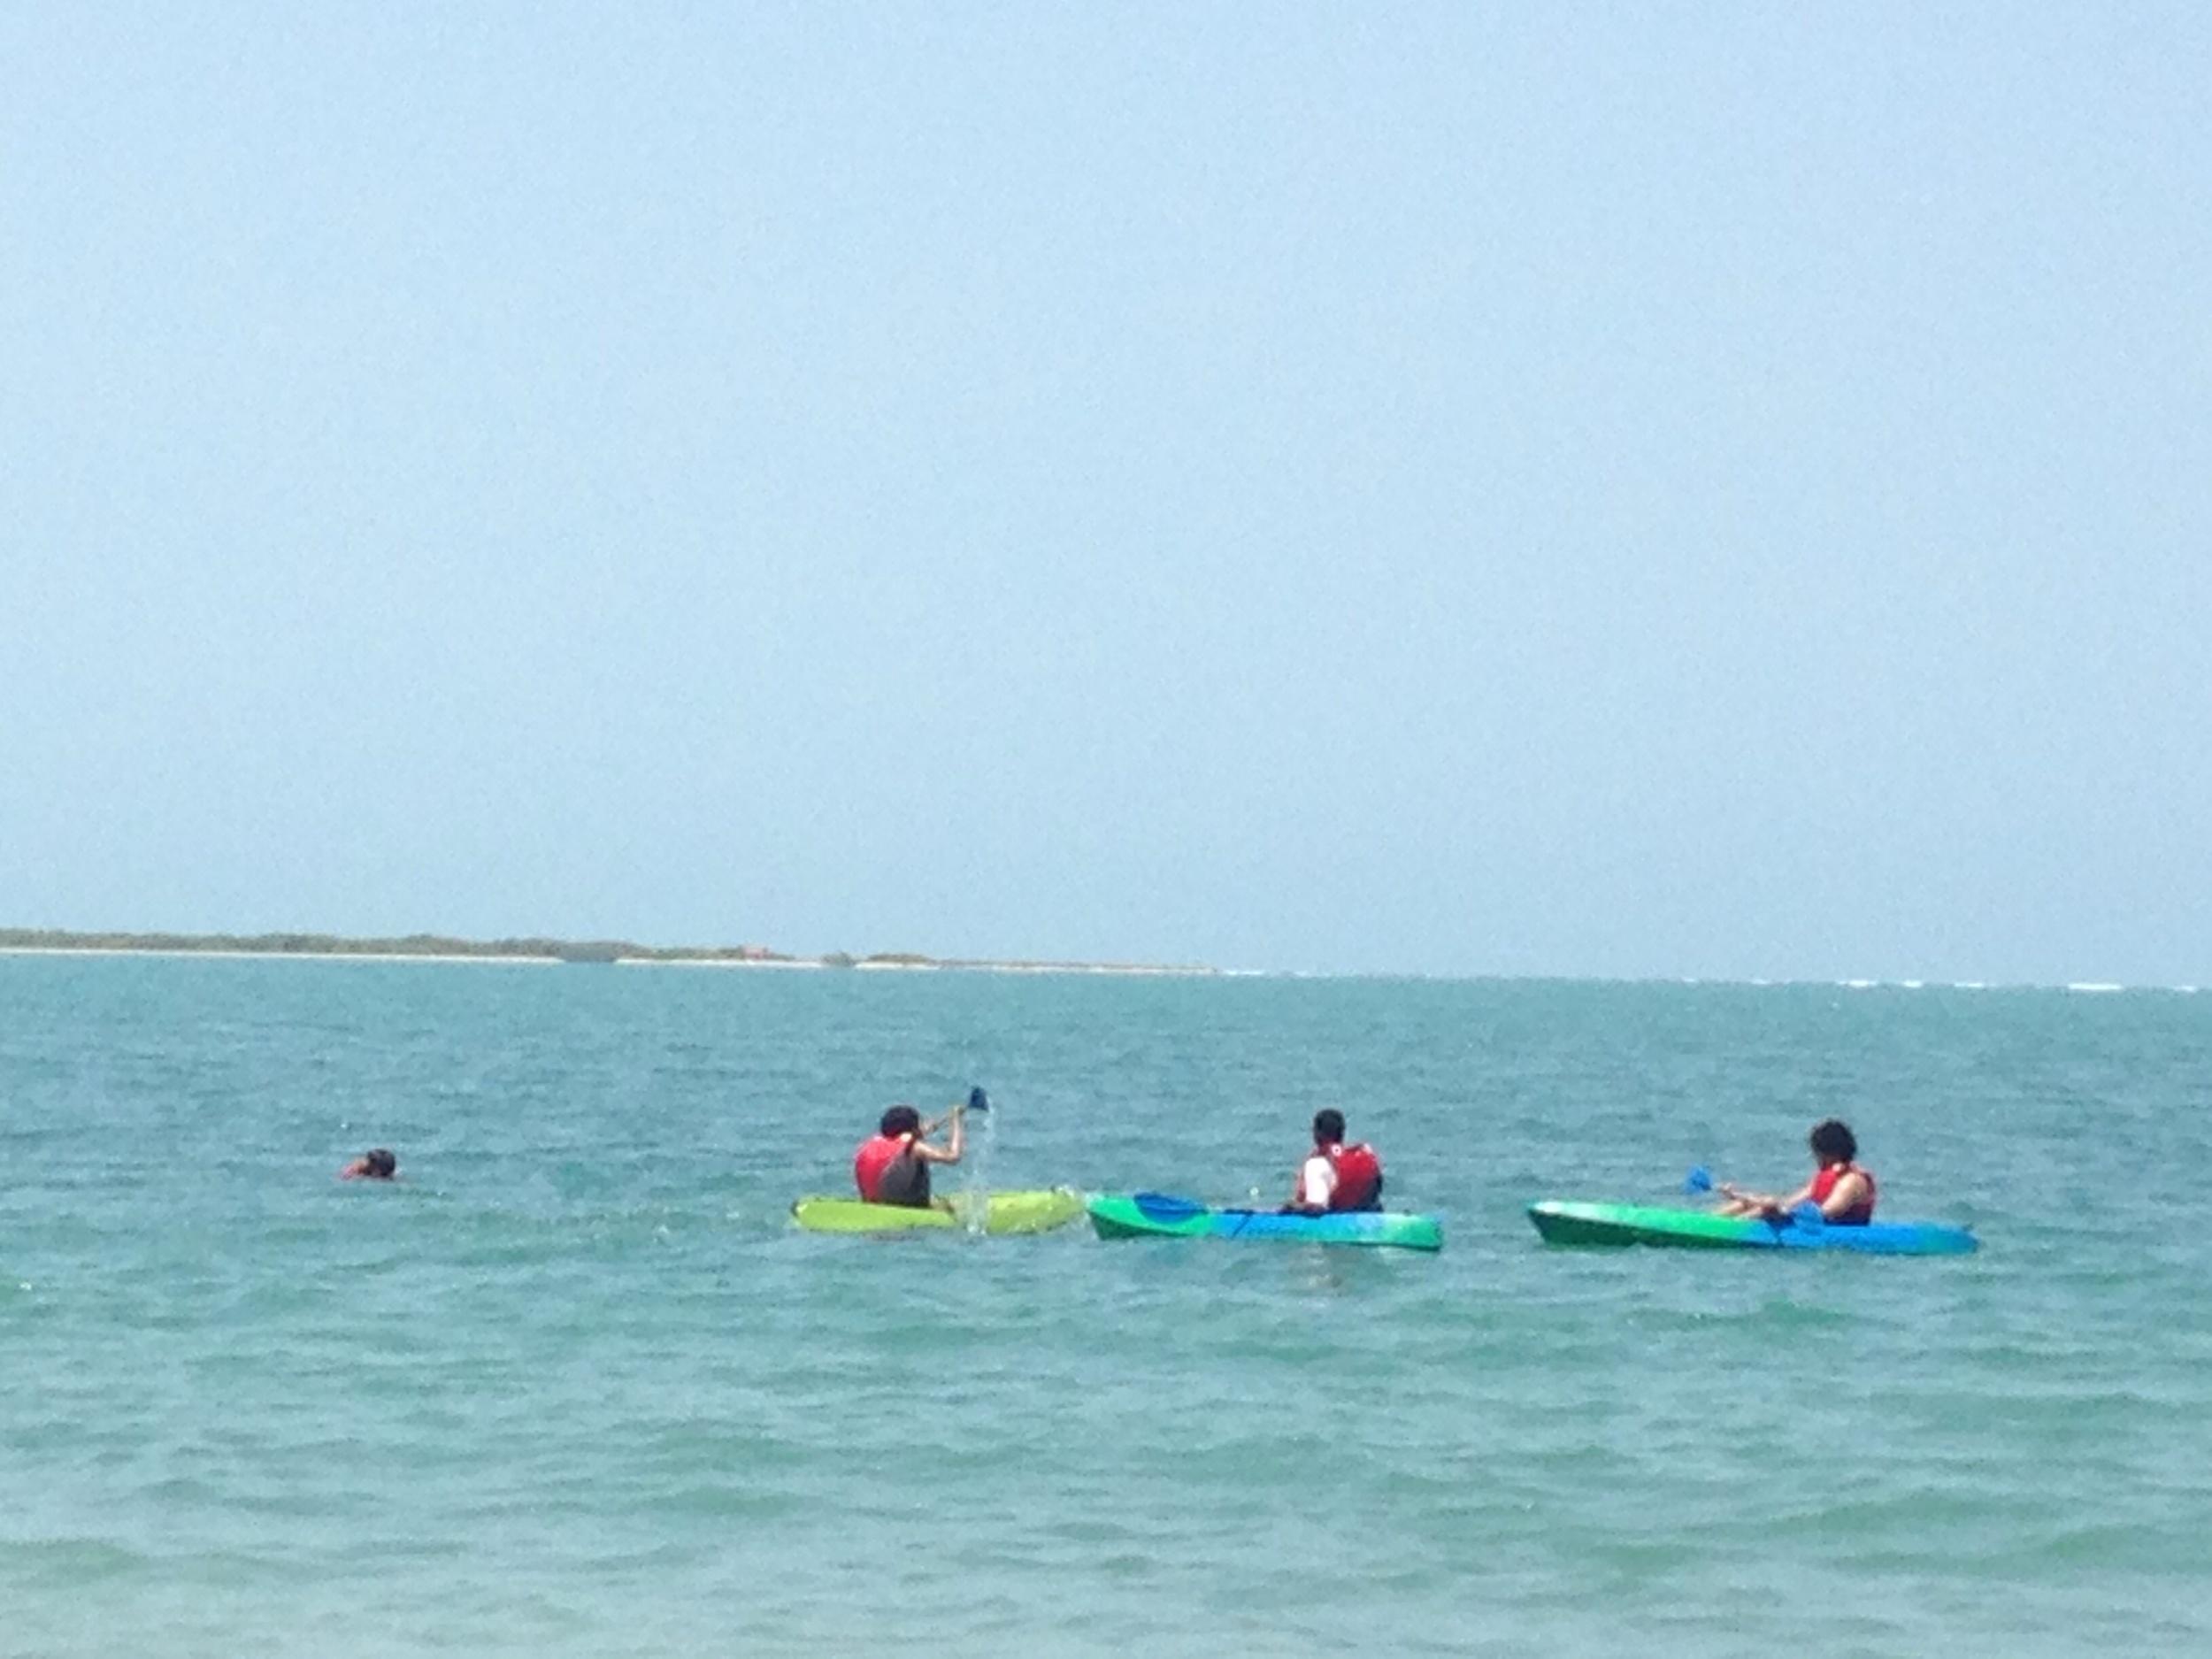 Kayaking in clear blue, kayaking in India